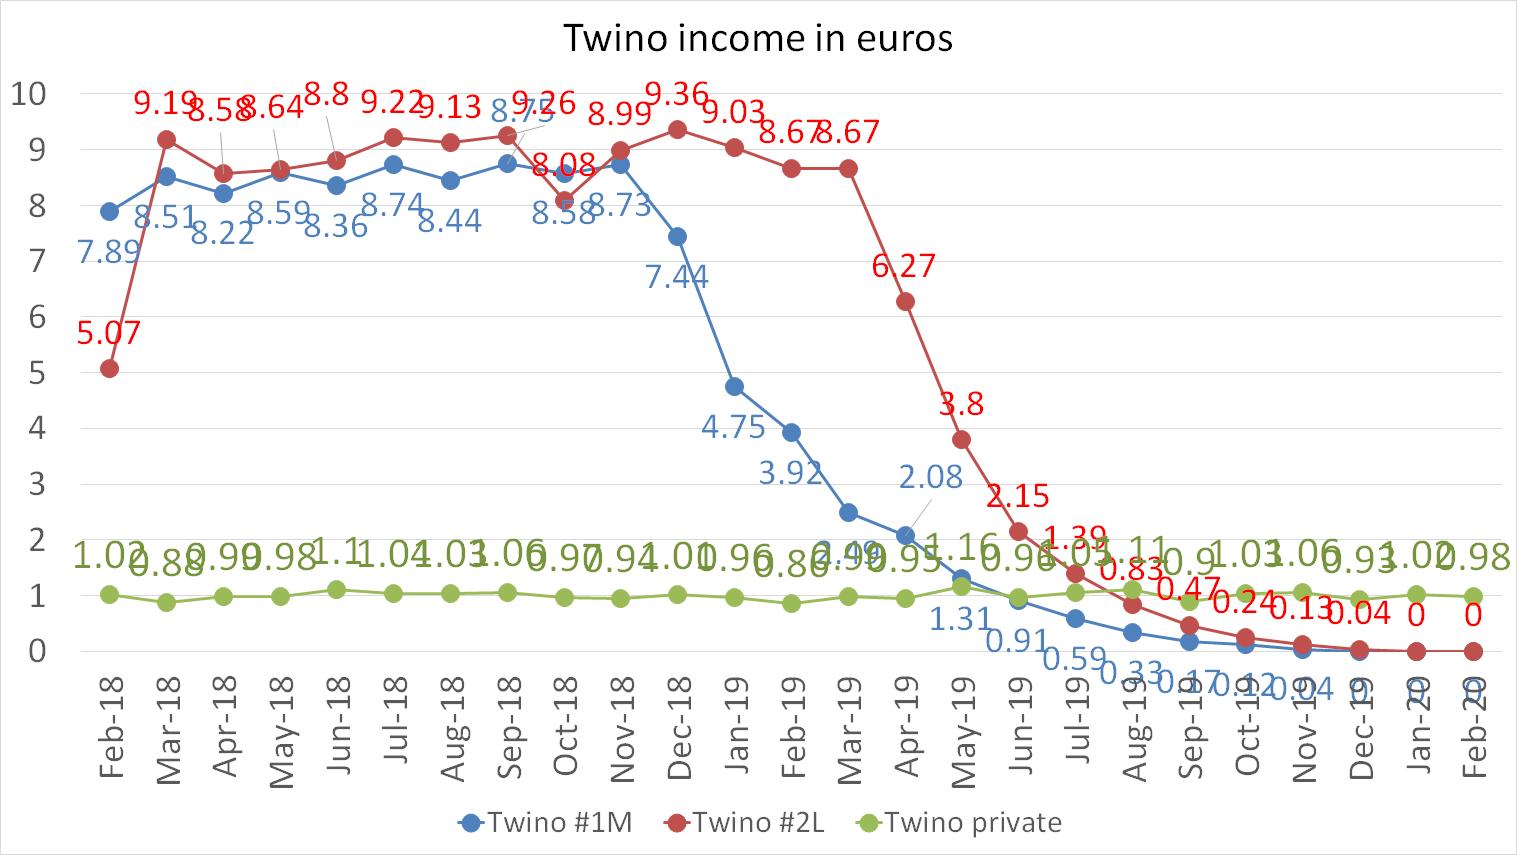 Twino income in euros february 2020